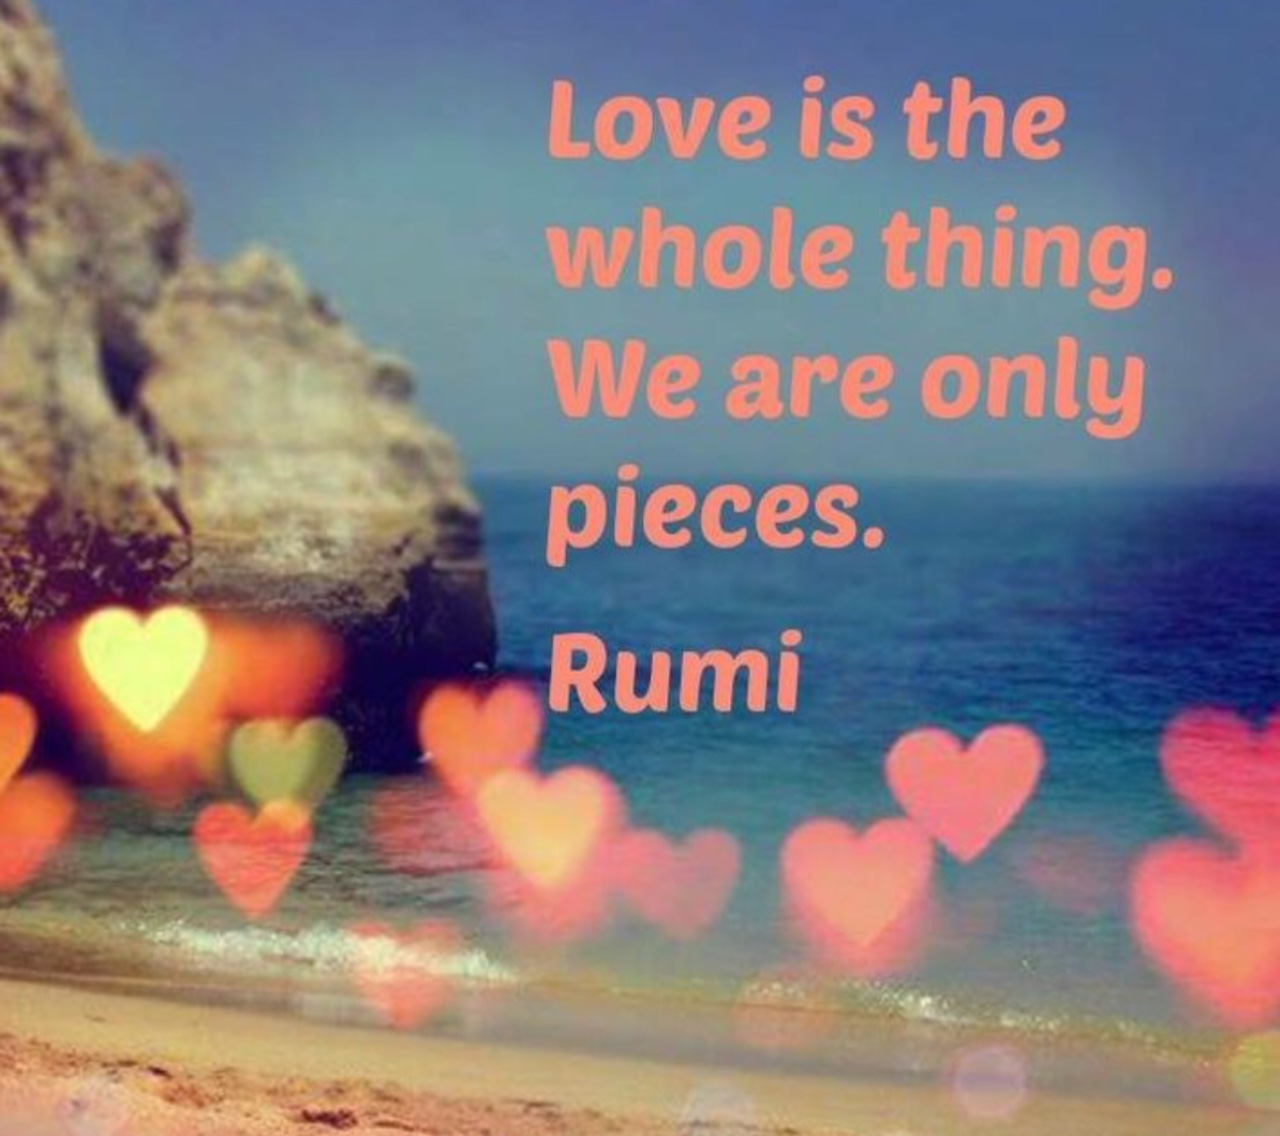 Rumi_4.jpg